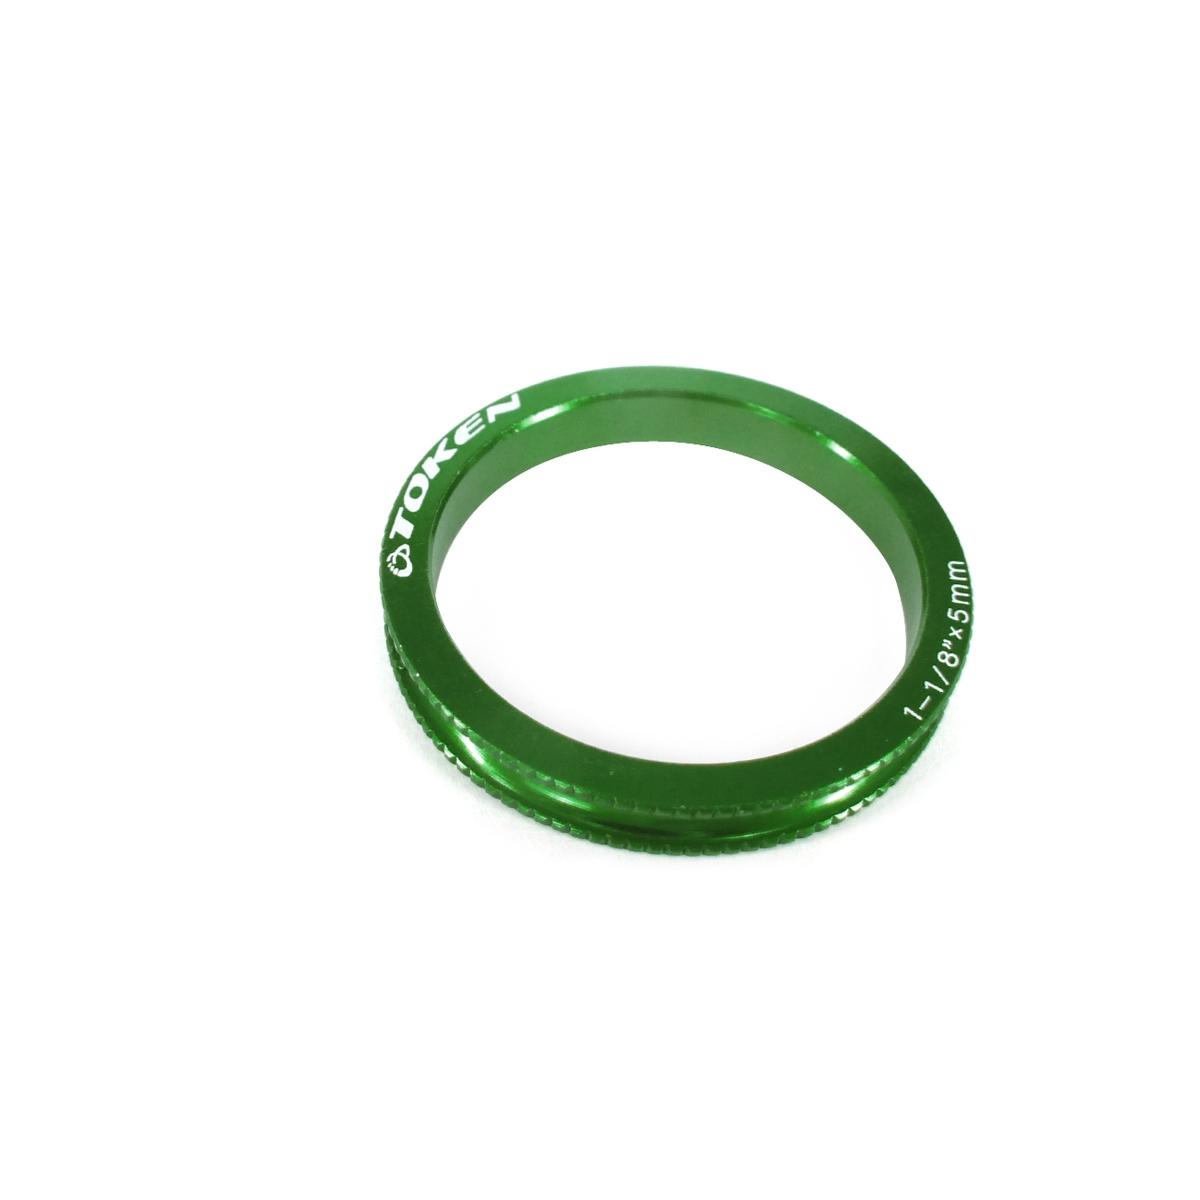 Entretoise Ahead-Set Token 5 mm 3,2 G Vert X 10